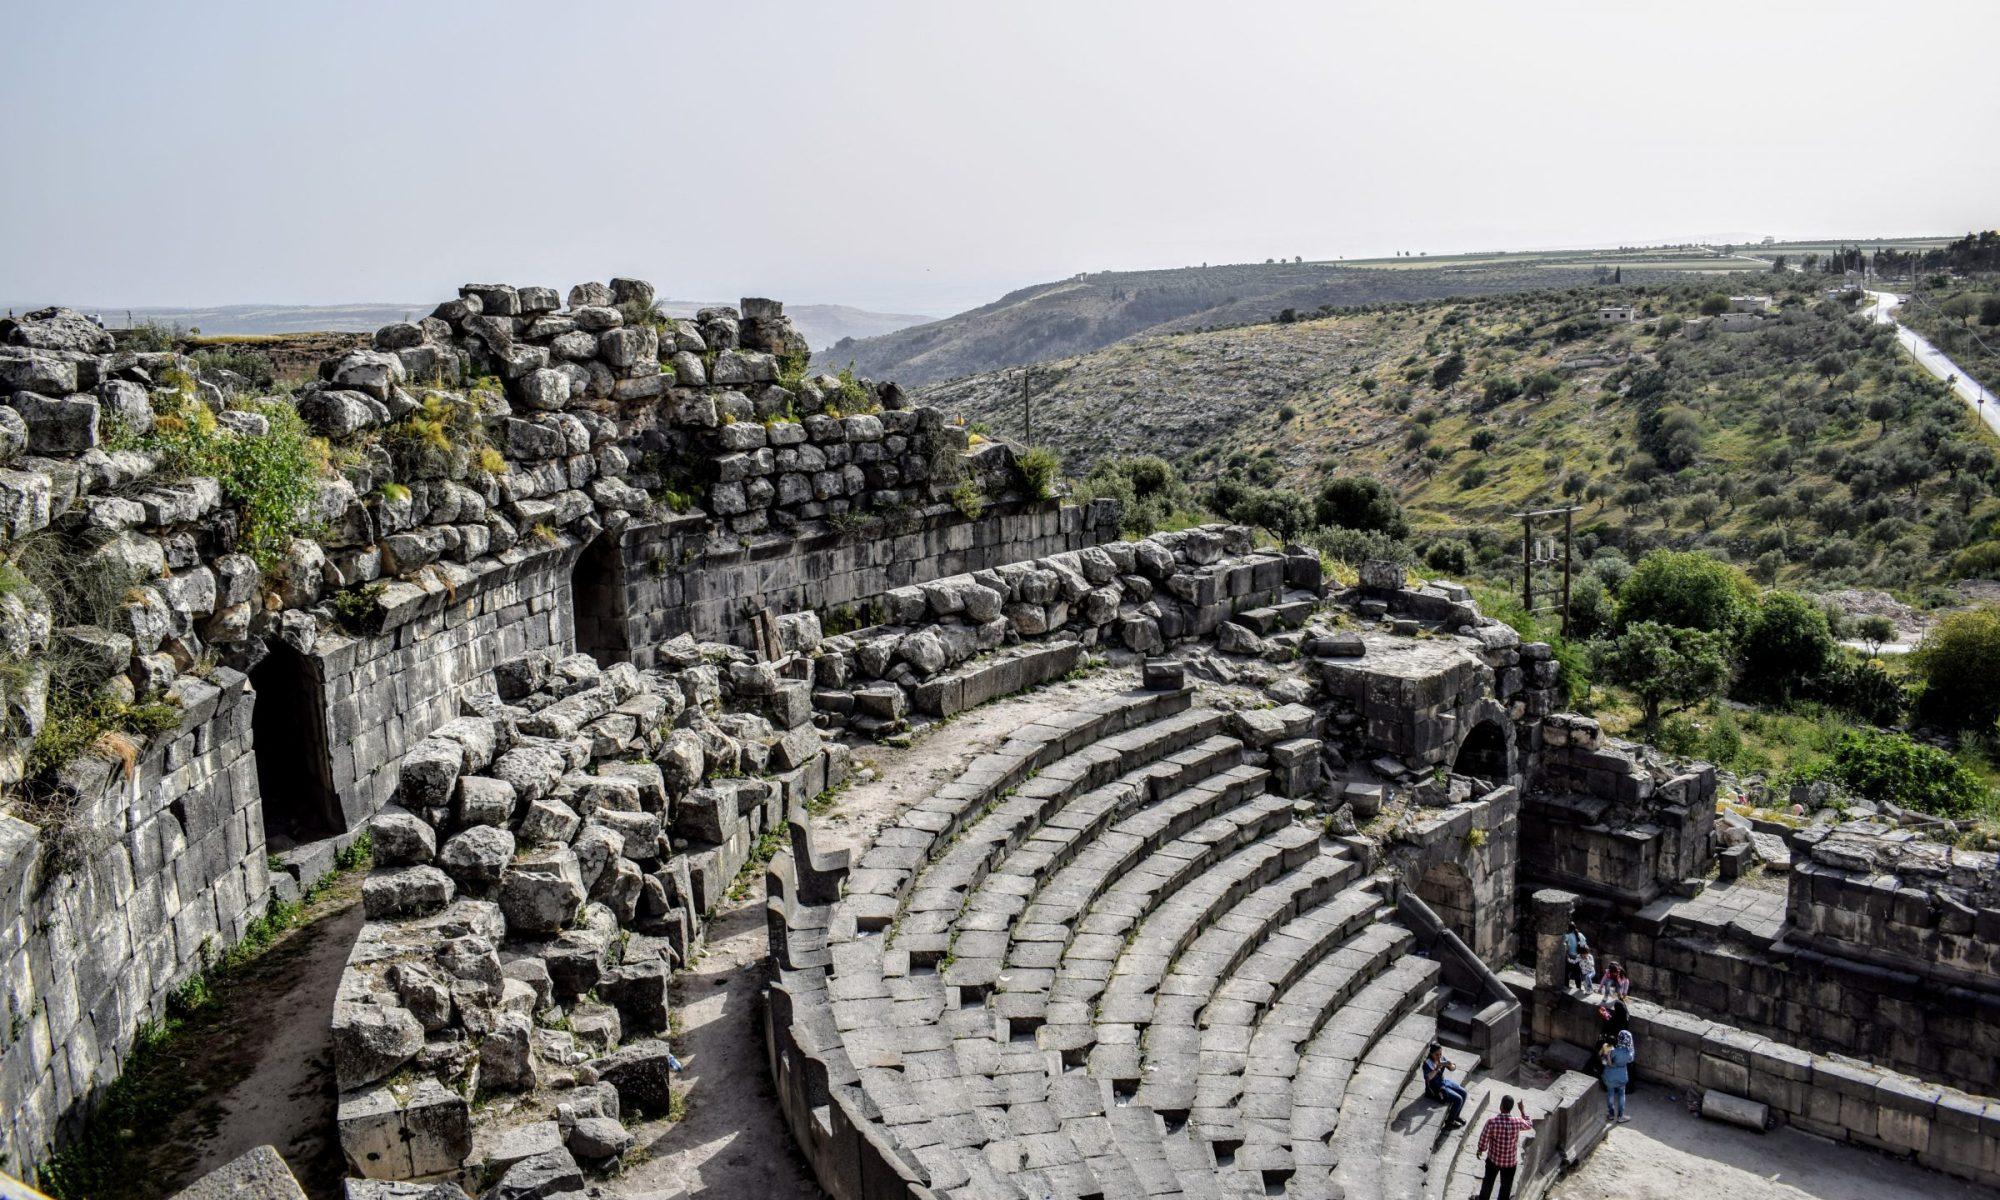 Roman theater made of black basalt stone at Umm Qais